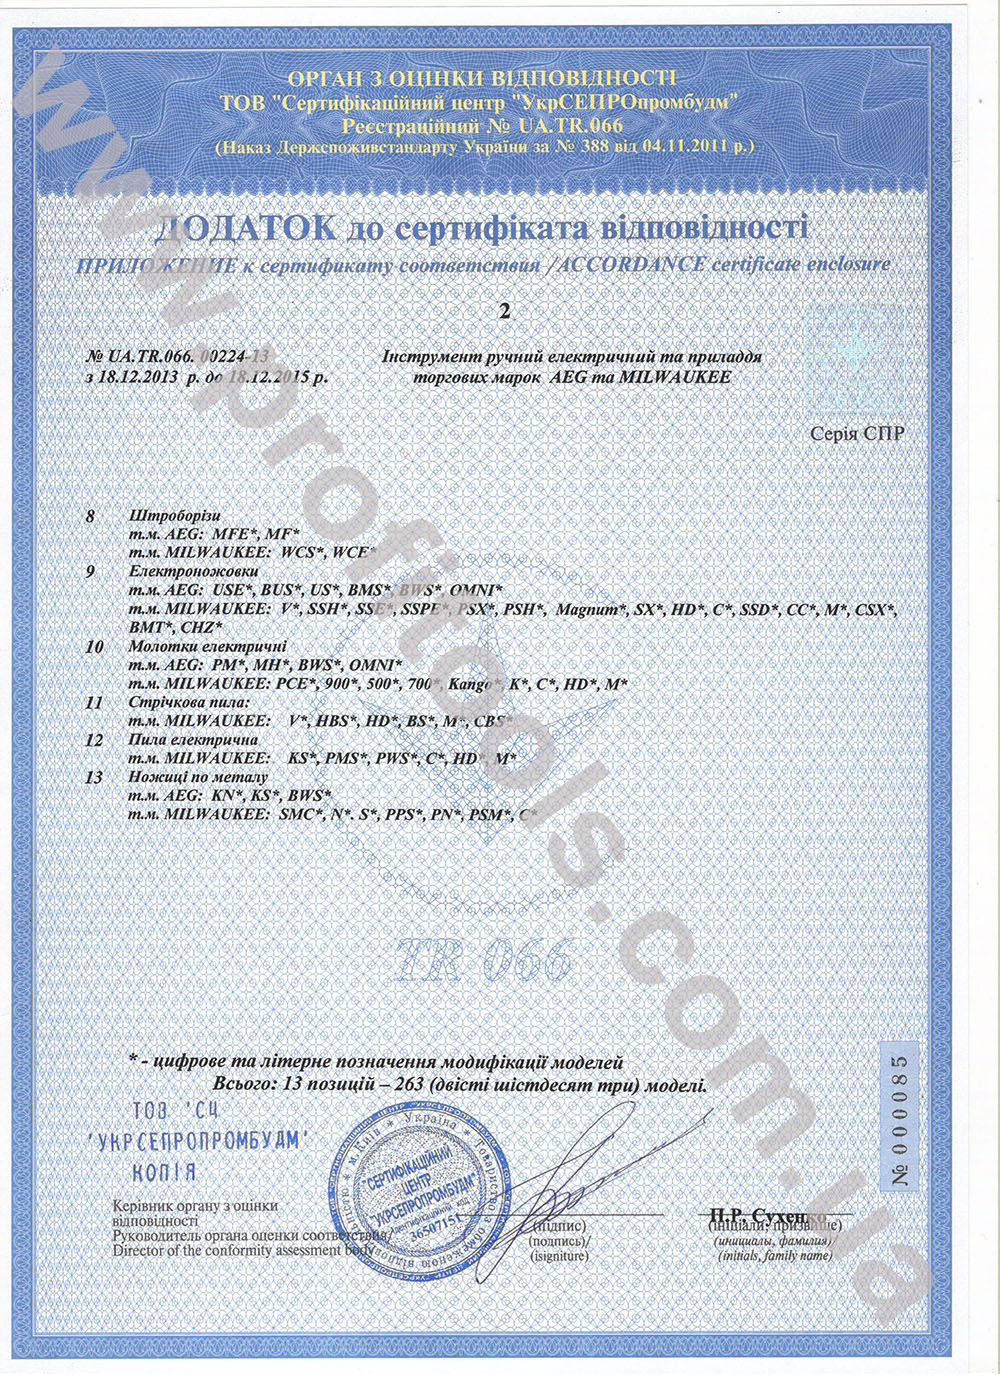 shares/Certificate/TTI/2.jpg